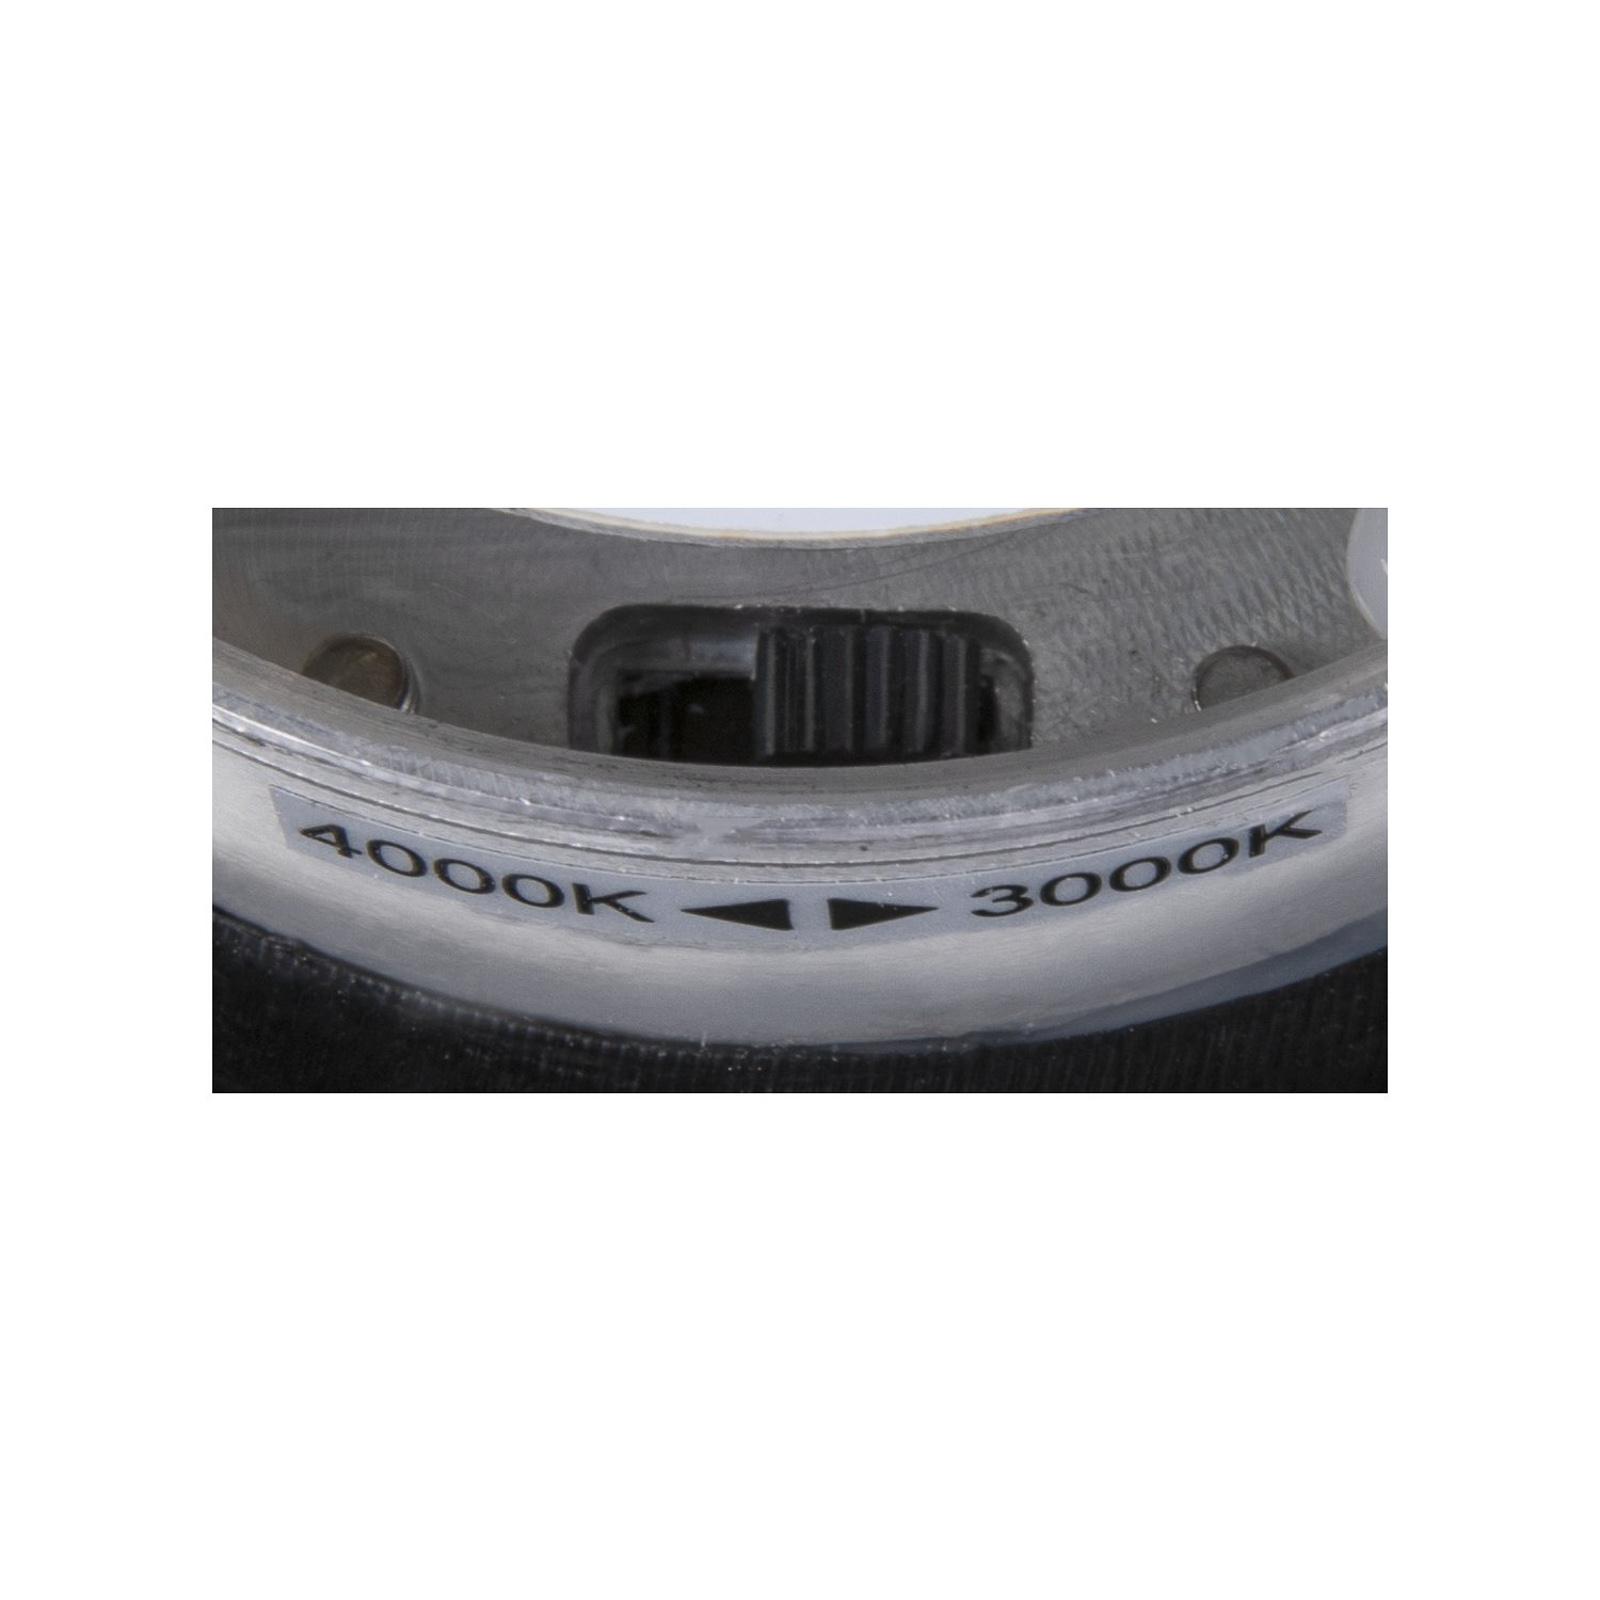 SLV Ovalisk słupek oświetleniowy LED CCT, 75 cm